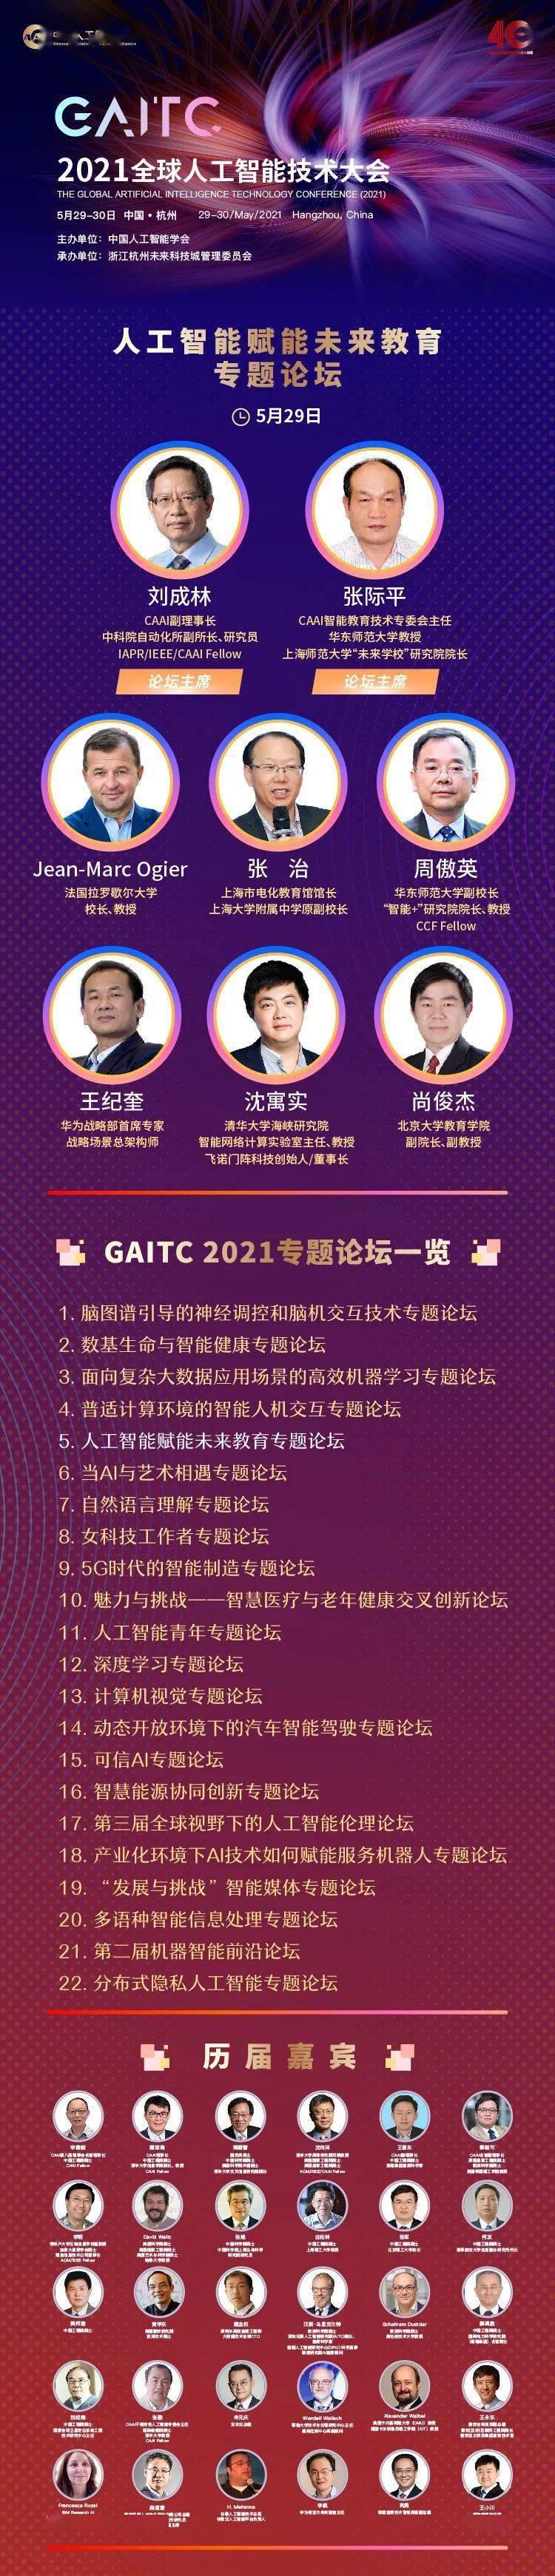 GAITC2021专题论坛丨拥抱人工智能,迎接未来教育